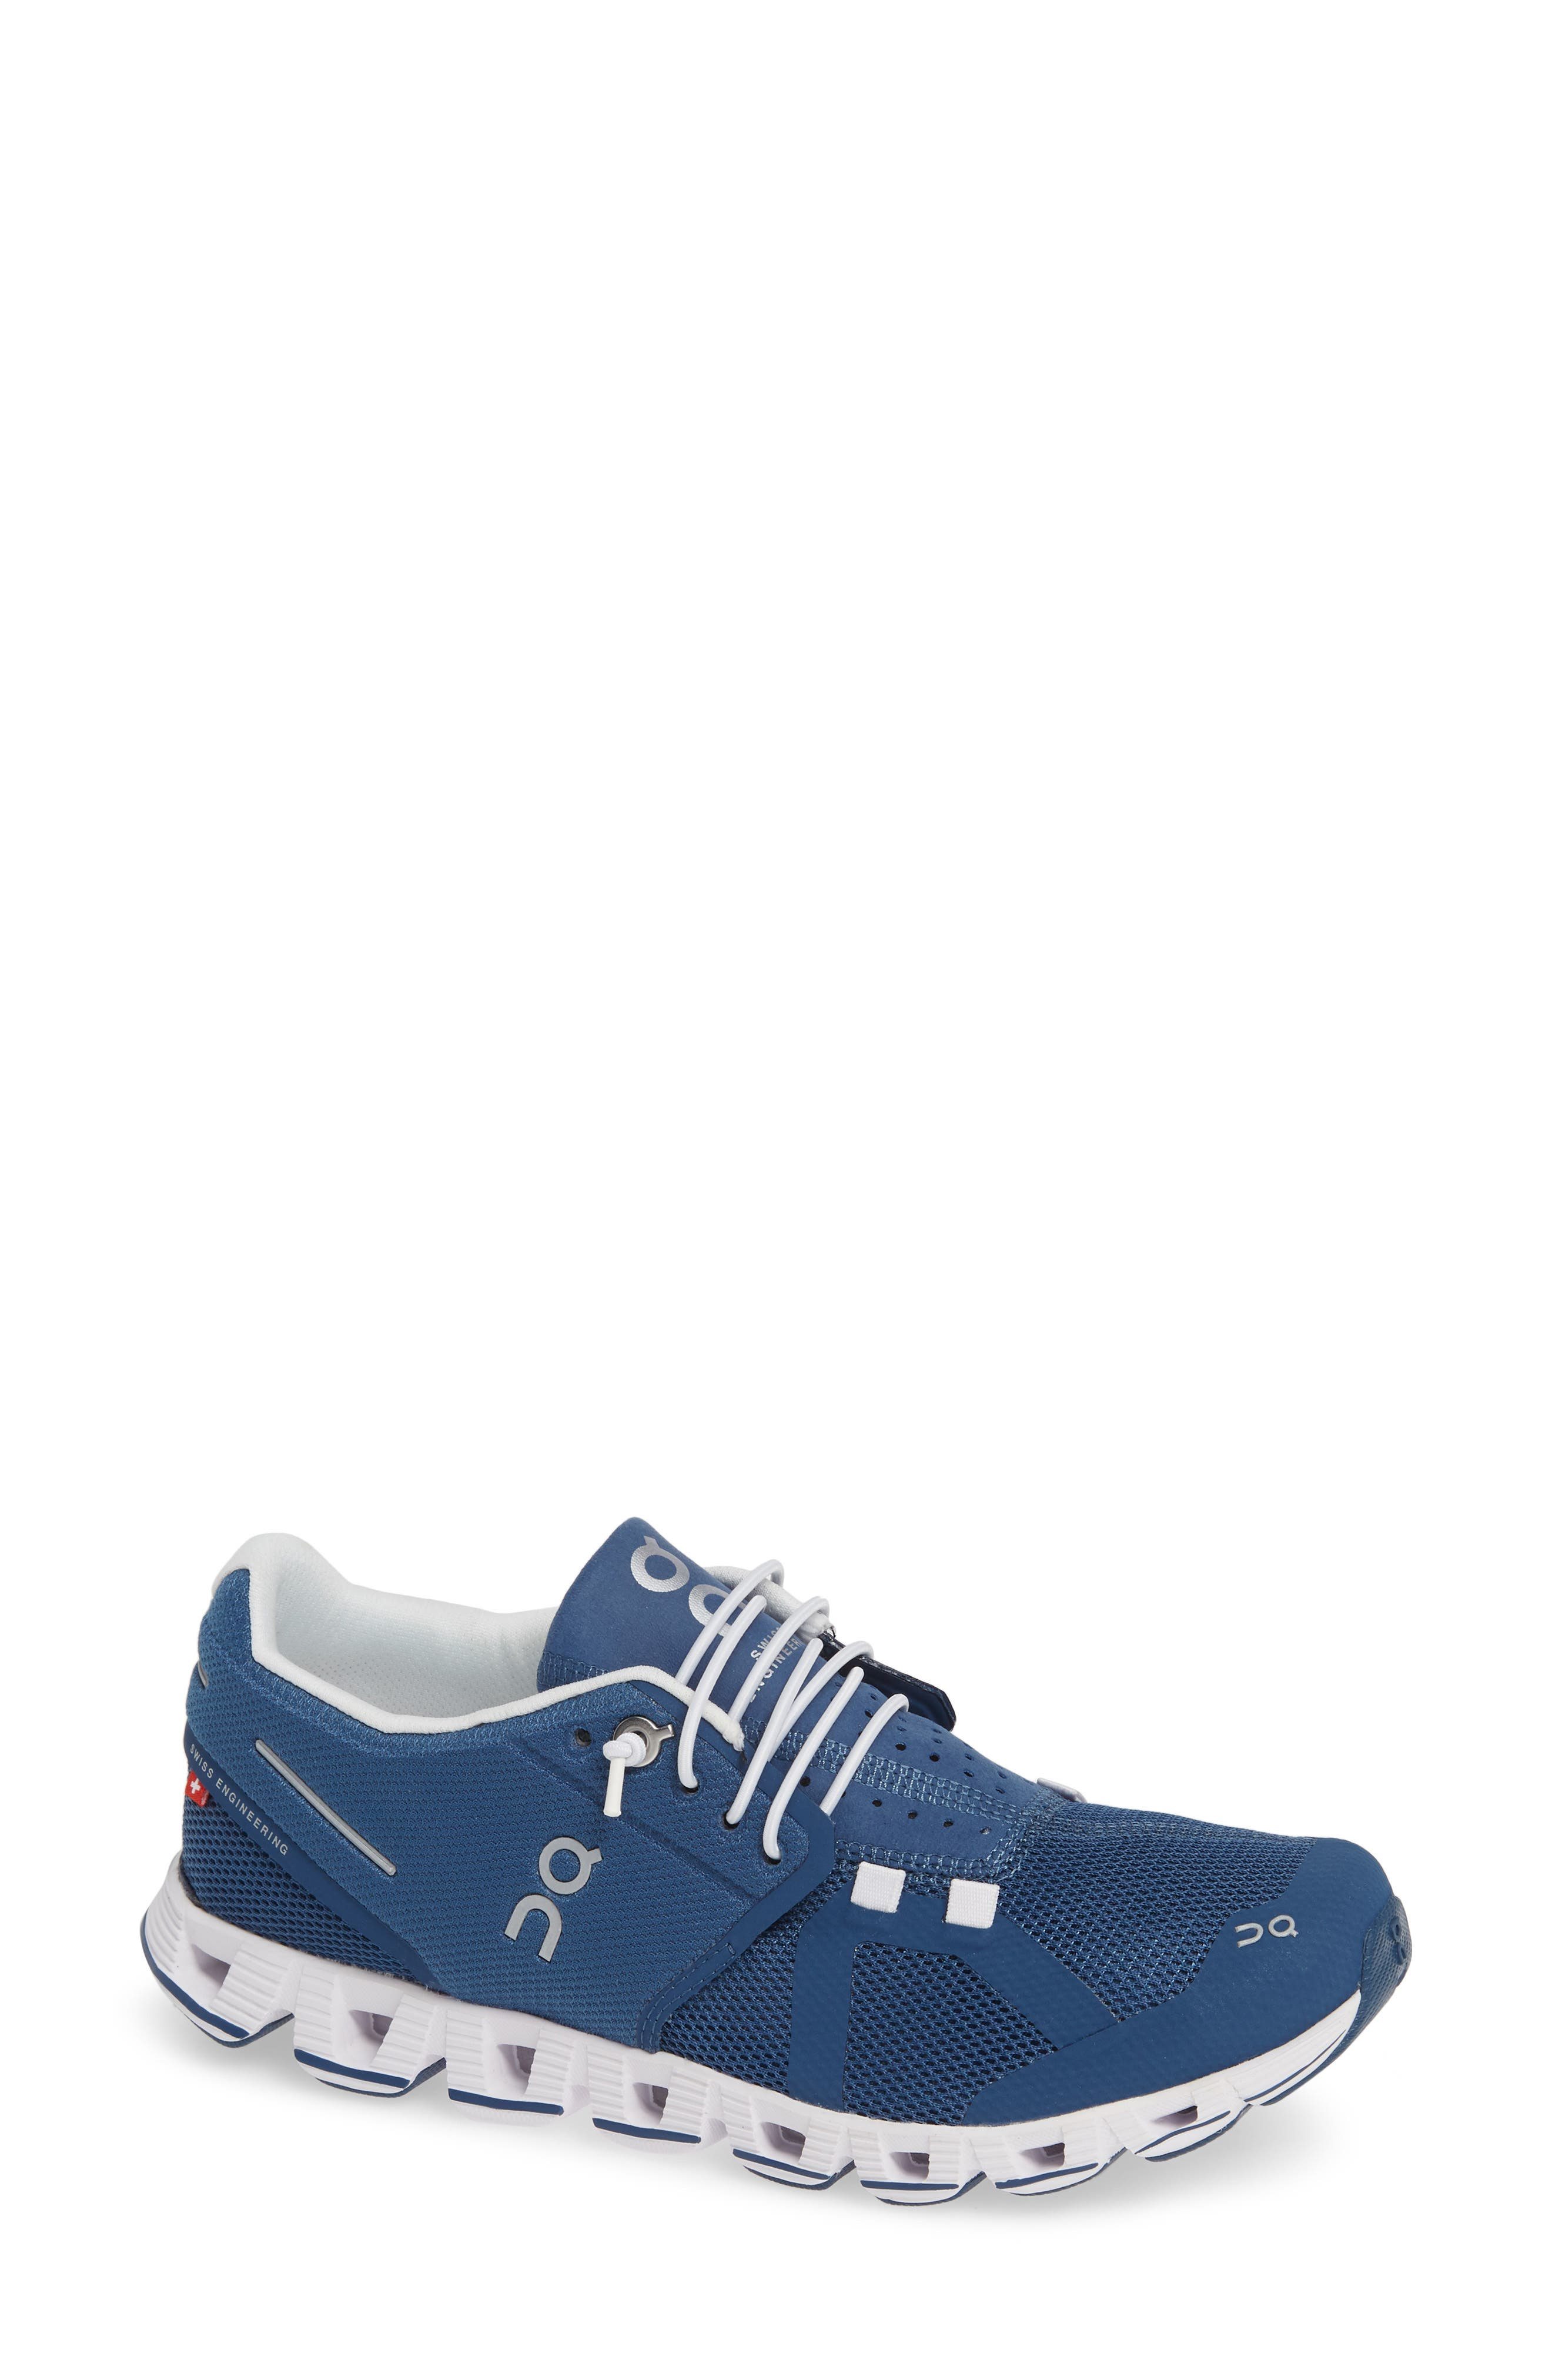 Women's Blue Sneakers \u0026 Athletic Shoes